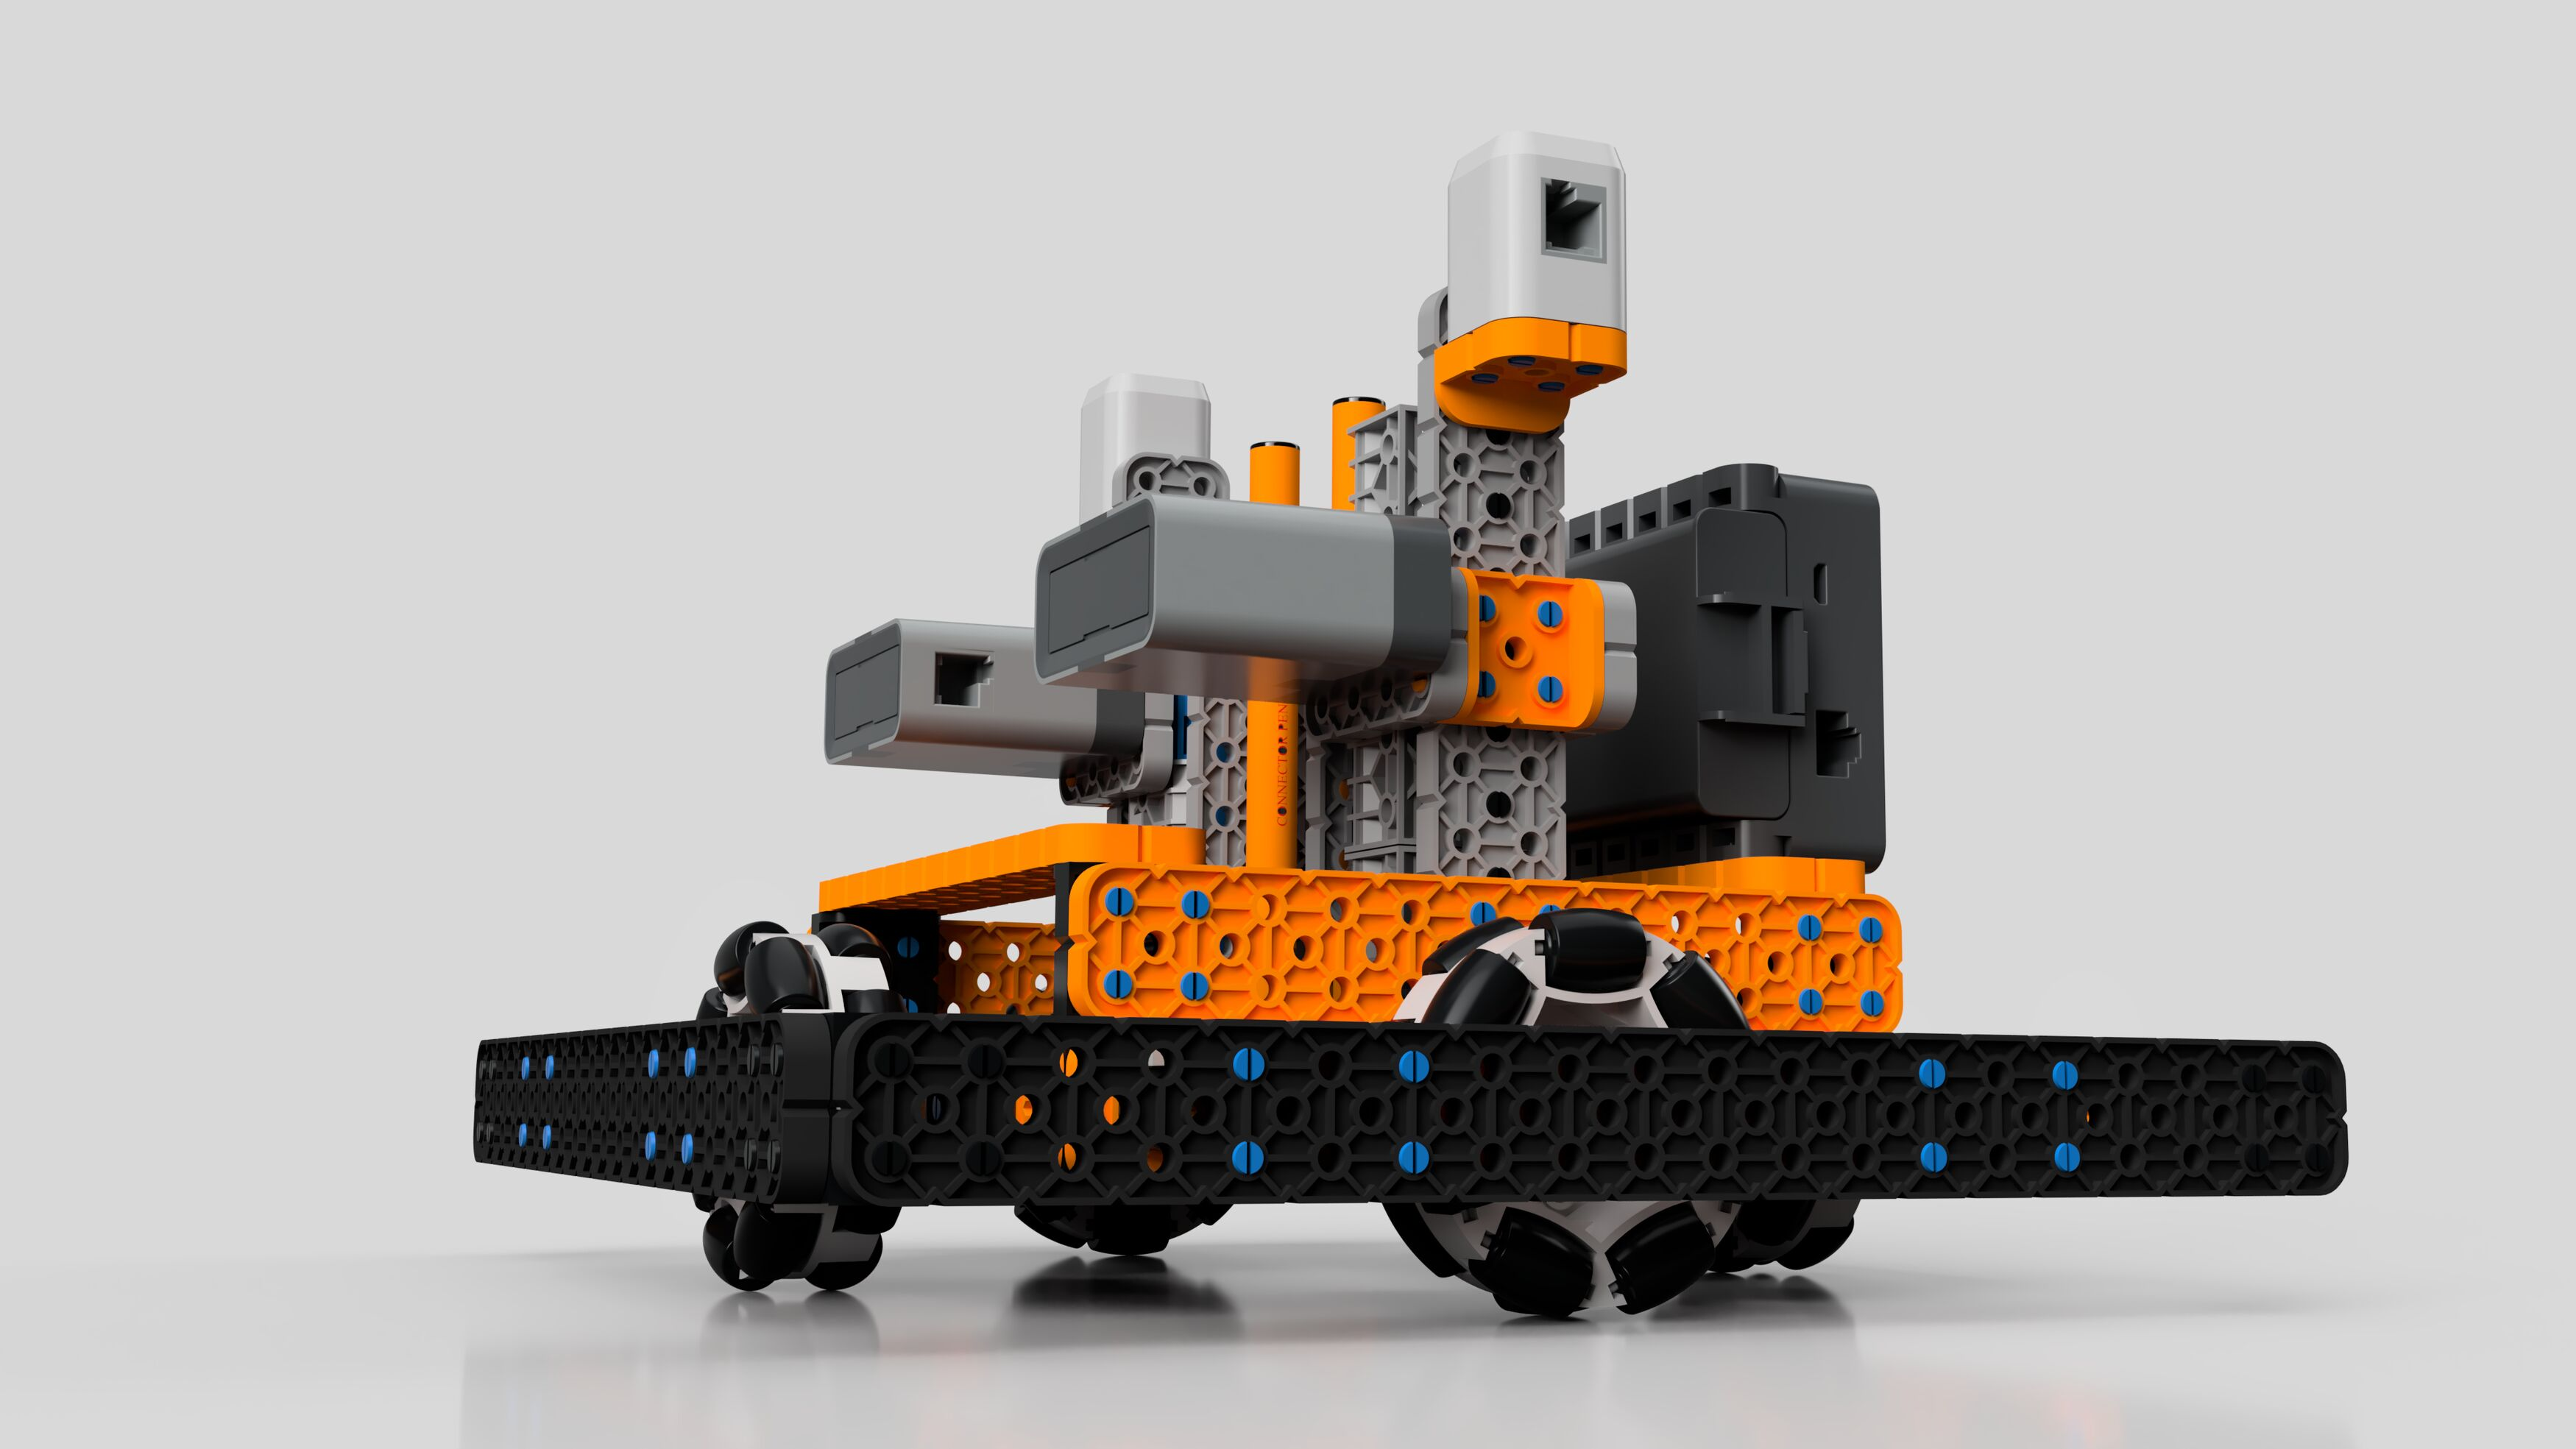 Robotics-pen-oficial-2-cores---fabrica-de-nerdes-2020-may-28-08-05-01pm-000-customizedview38889869763-png-3500-3500